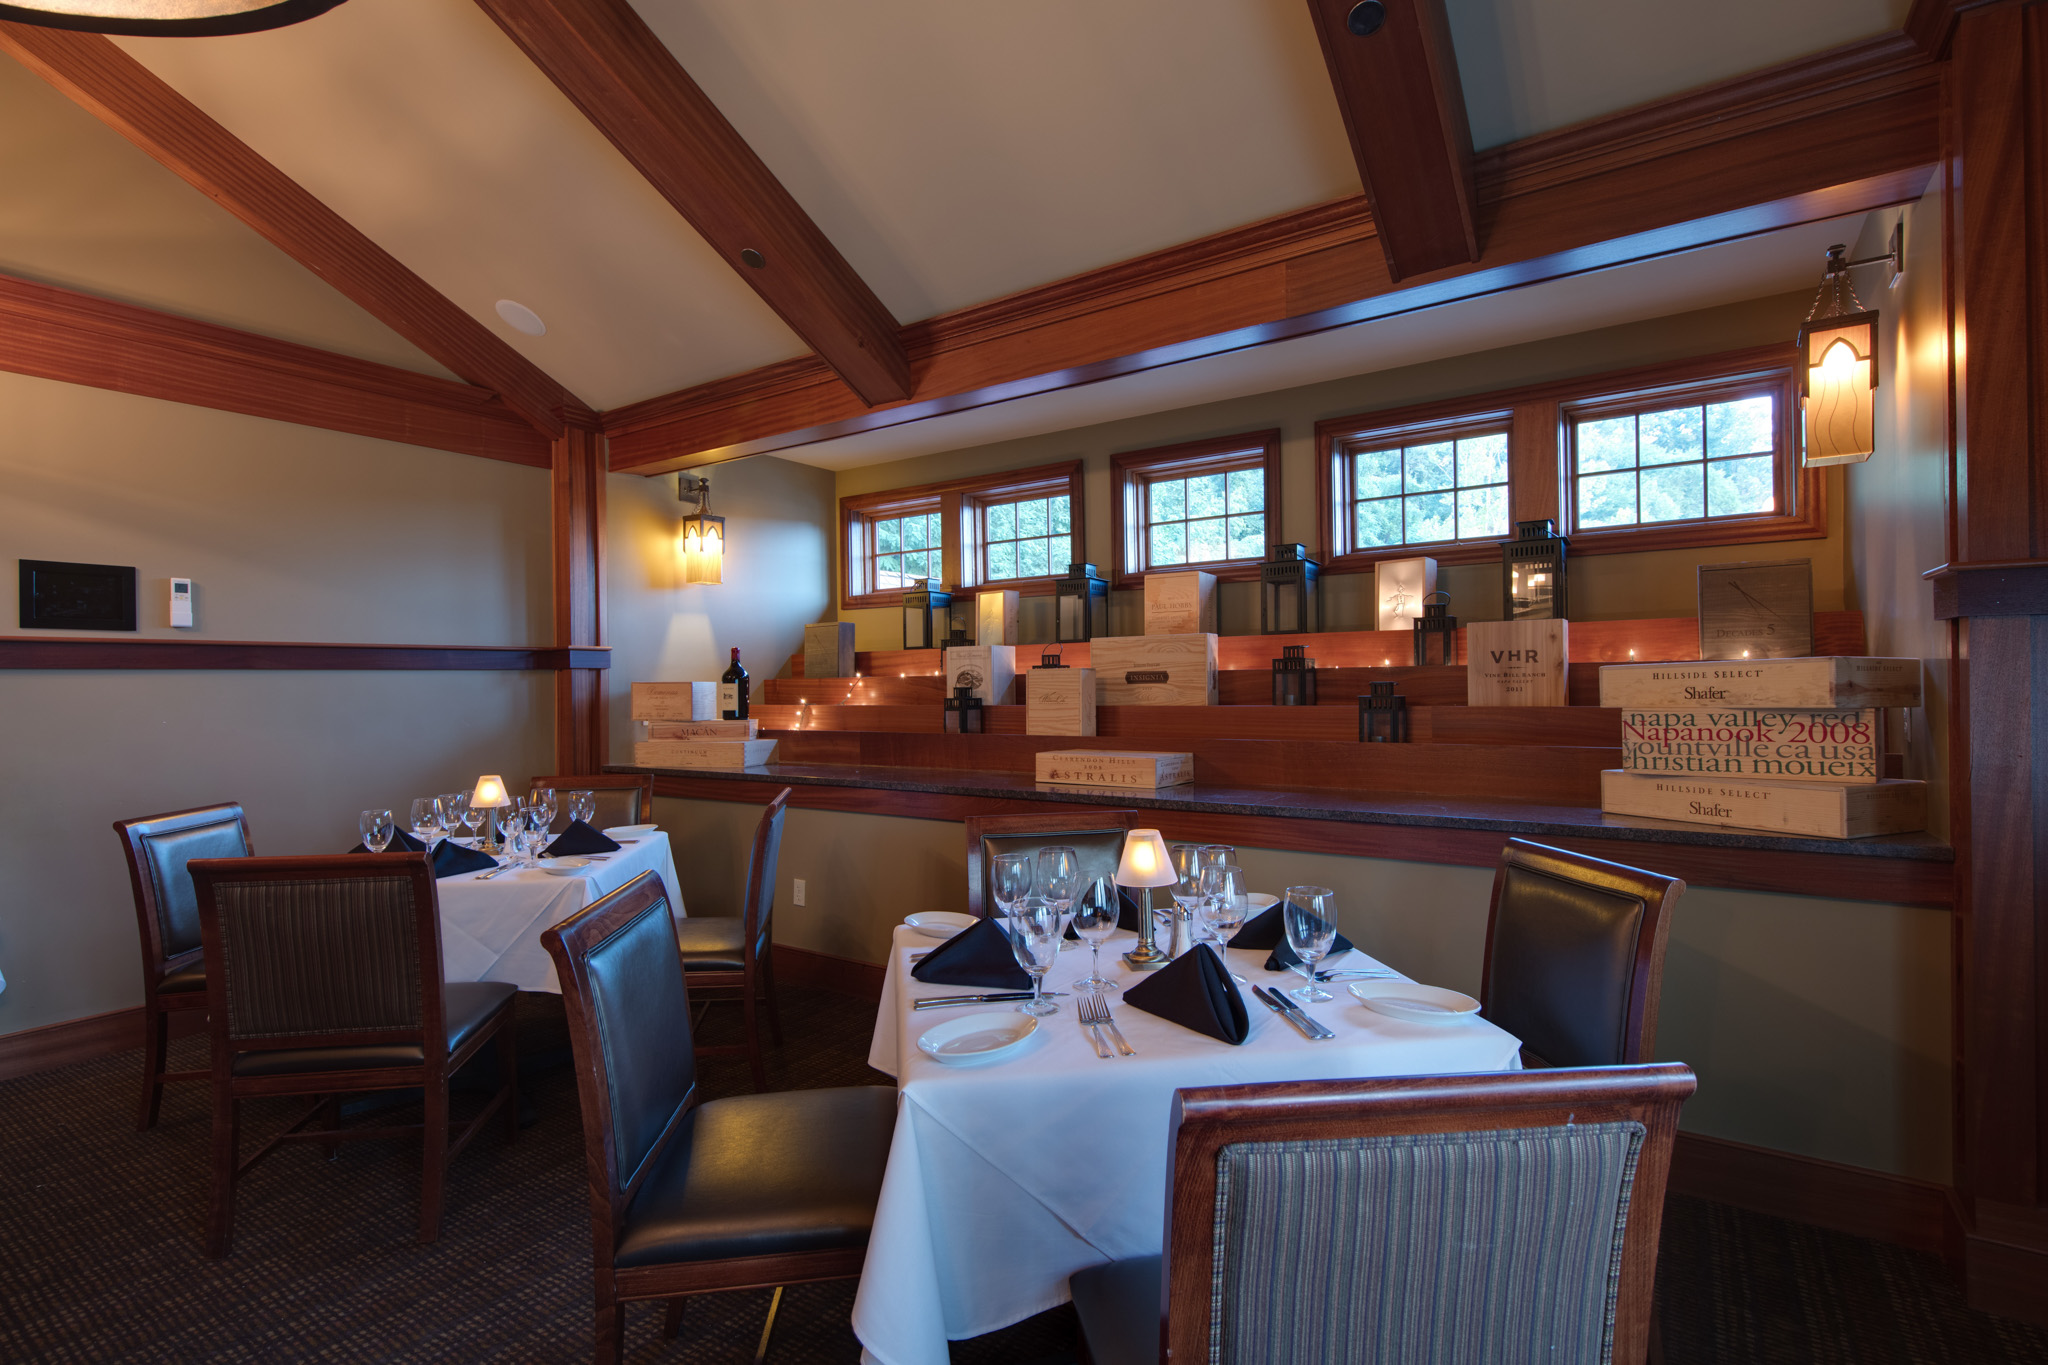 Ruth's Chris Steak House 5